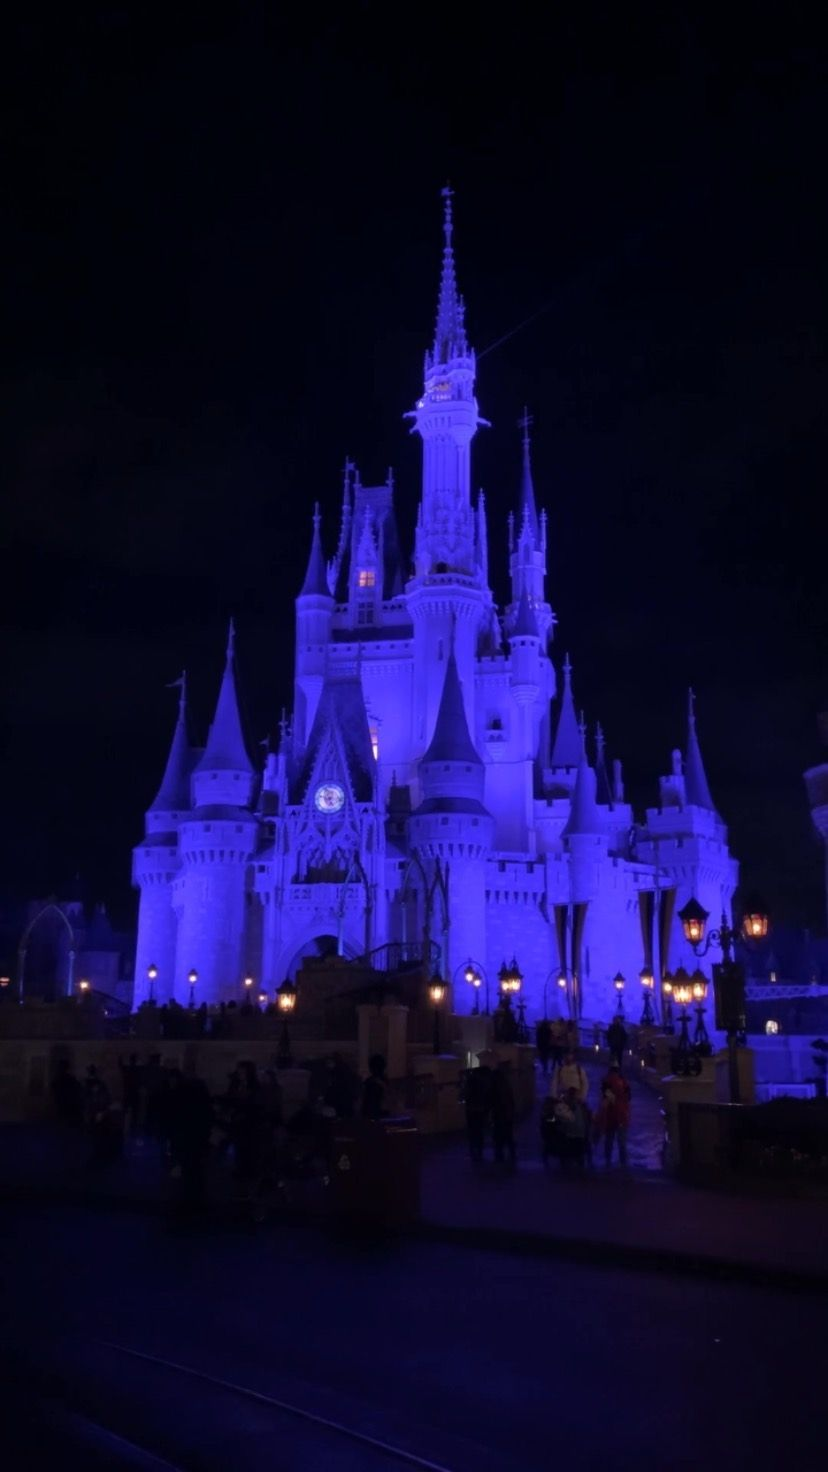 wannabephotographer33 on Instagram: The magic I miss 💫 - - - - #cinderellacastle #magickingdom #disney #waltdisneyworld #waltdisney #disneyparkslive #disneylife…